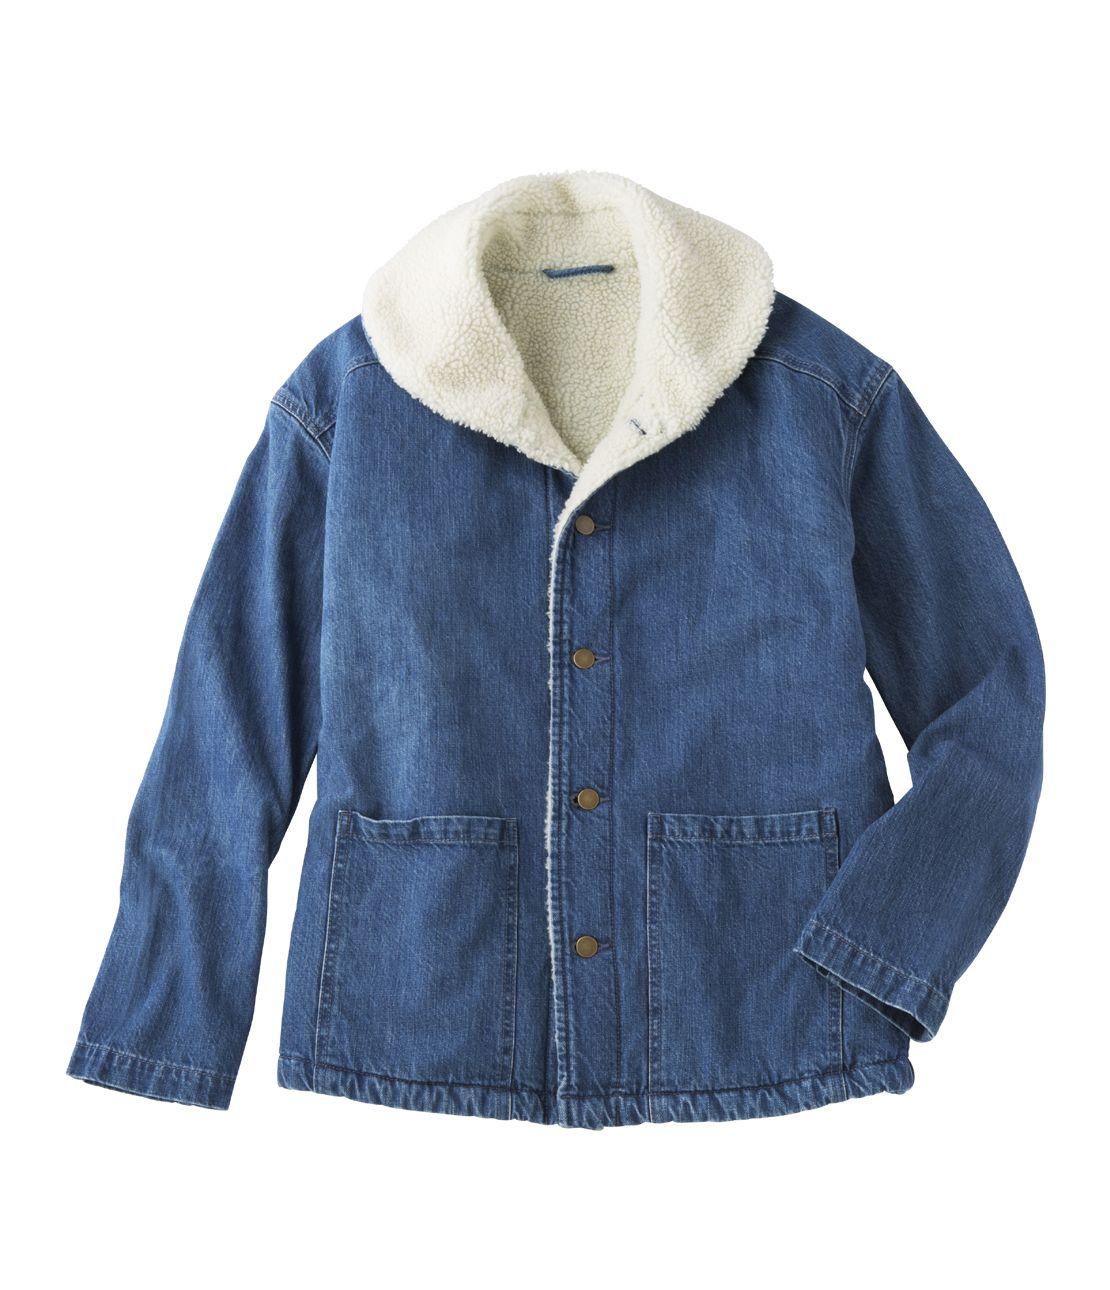 JRK embroidery printdenimboa jacket